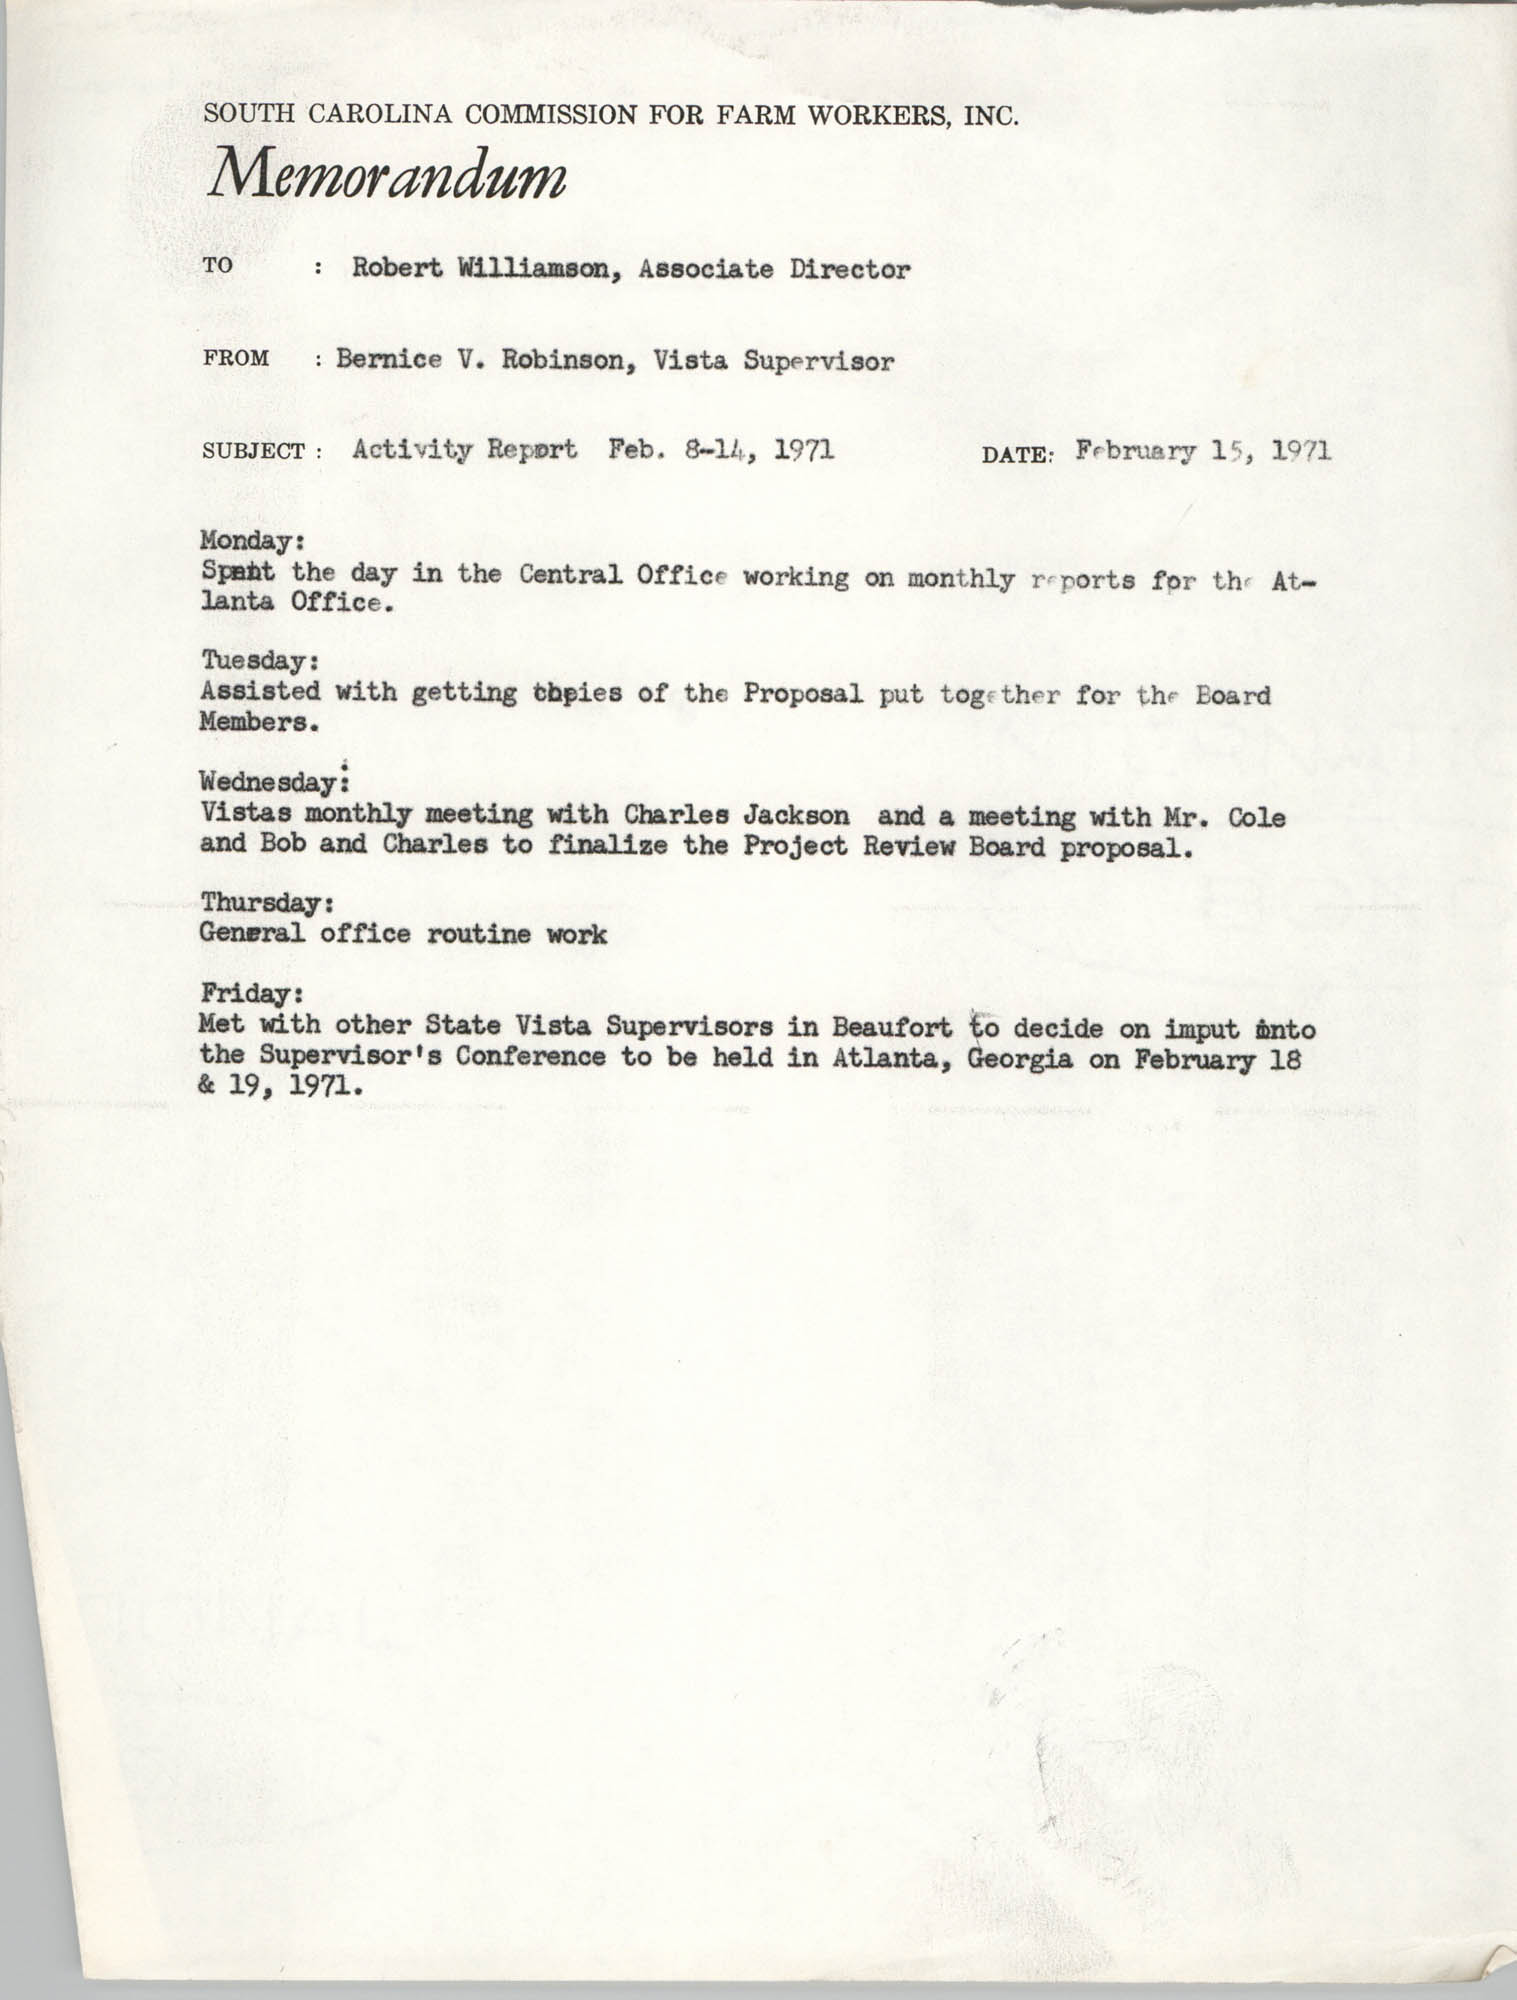 Memorandum from Bernice V. Robinson to Robert Williamson, February 15, 1971